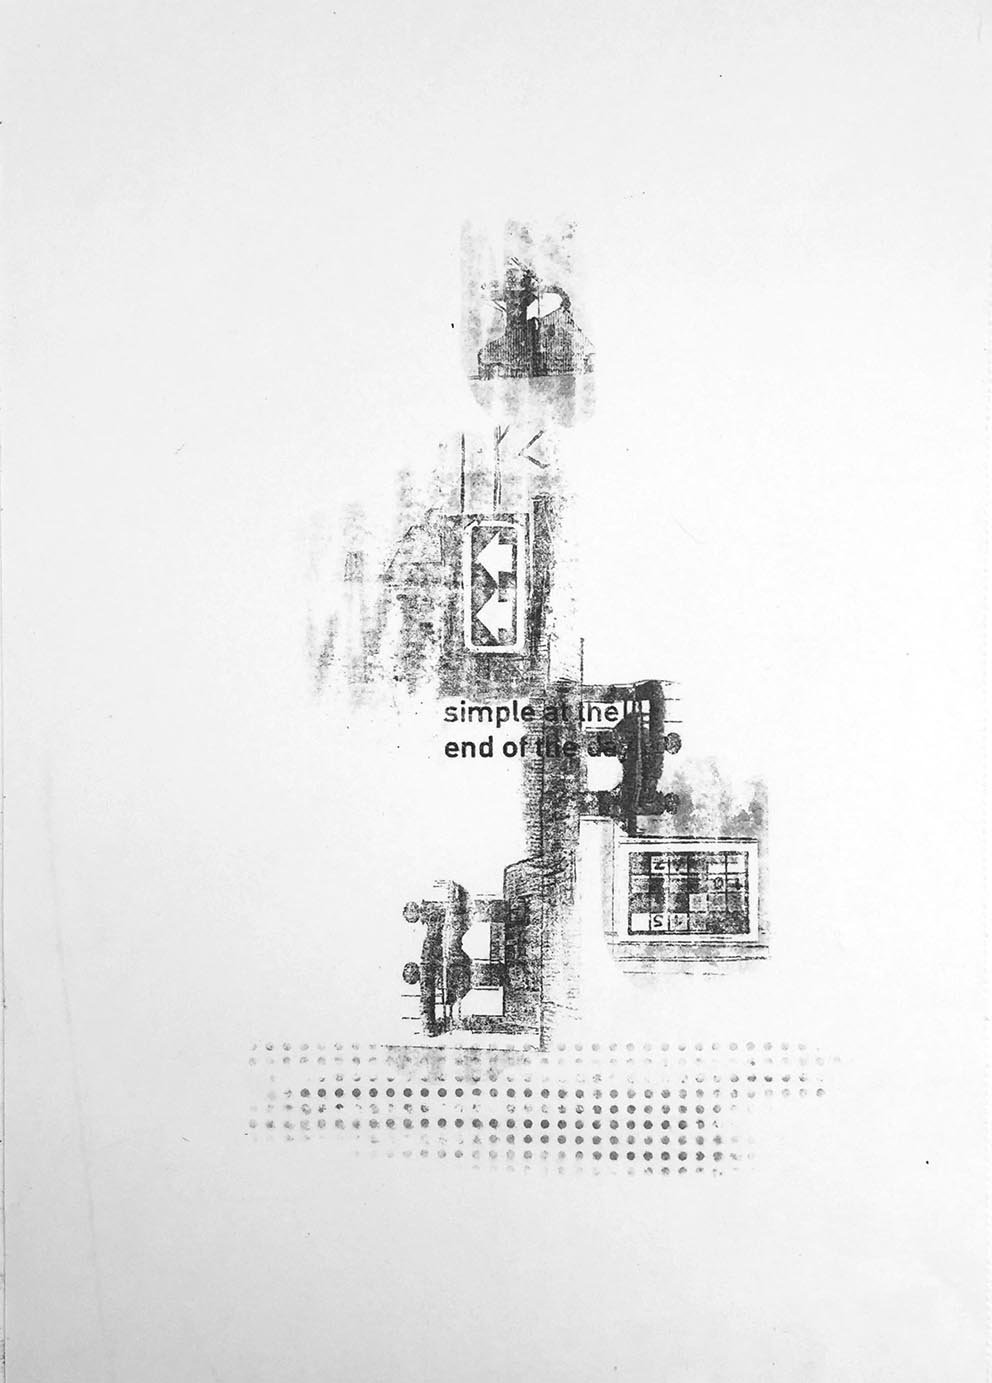 adam guy, crash, art, collage, artists, British artist, planes, suburbia, contemporary art, adam guy contemporary artist, artwork, print